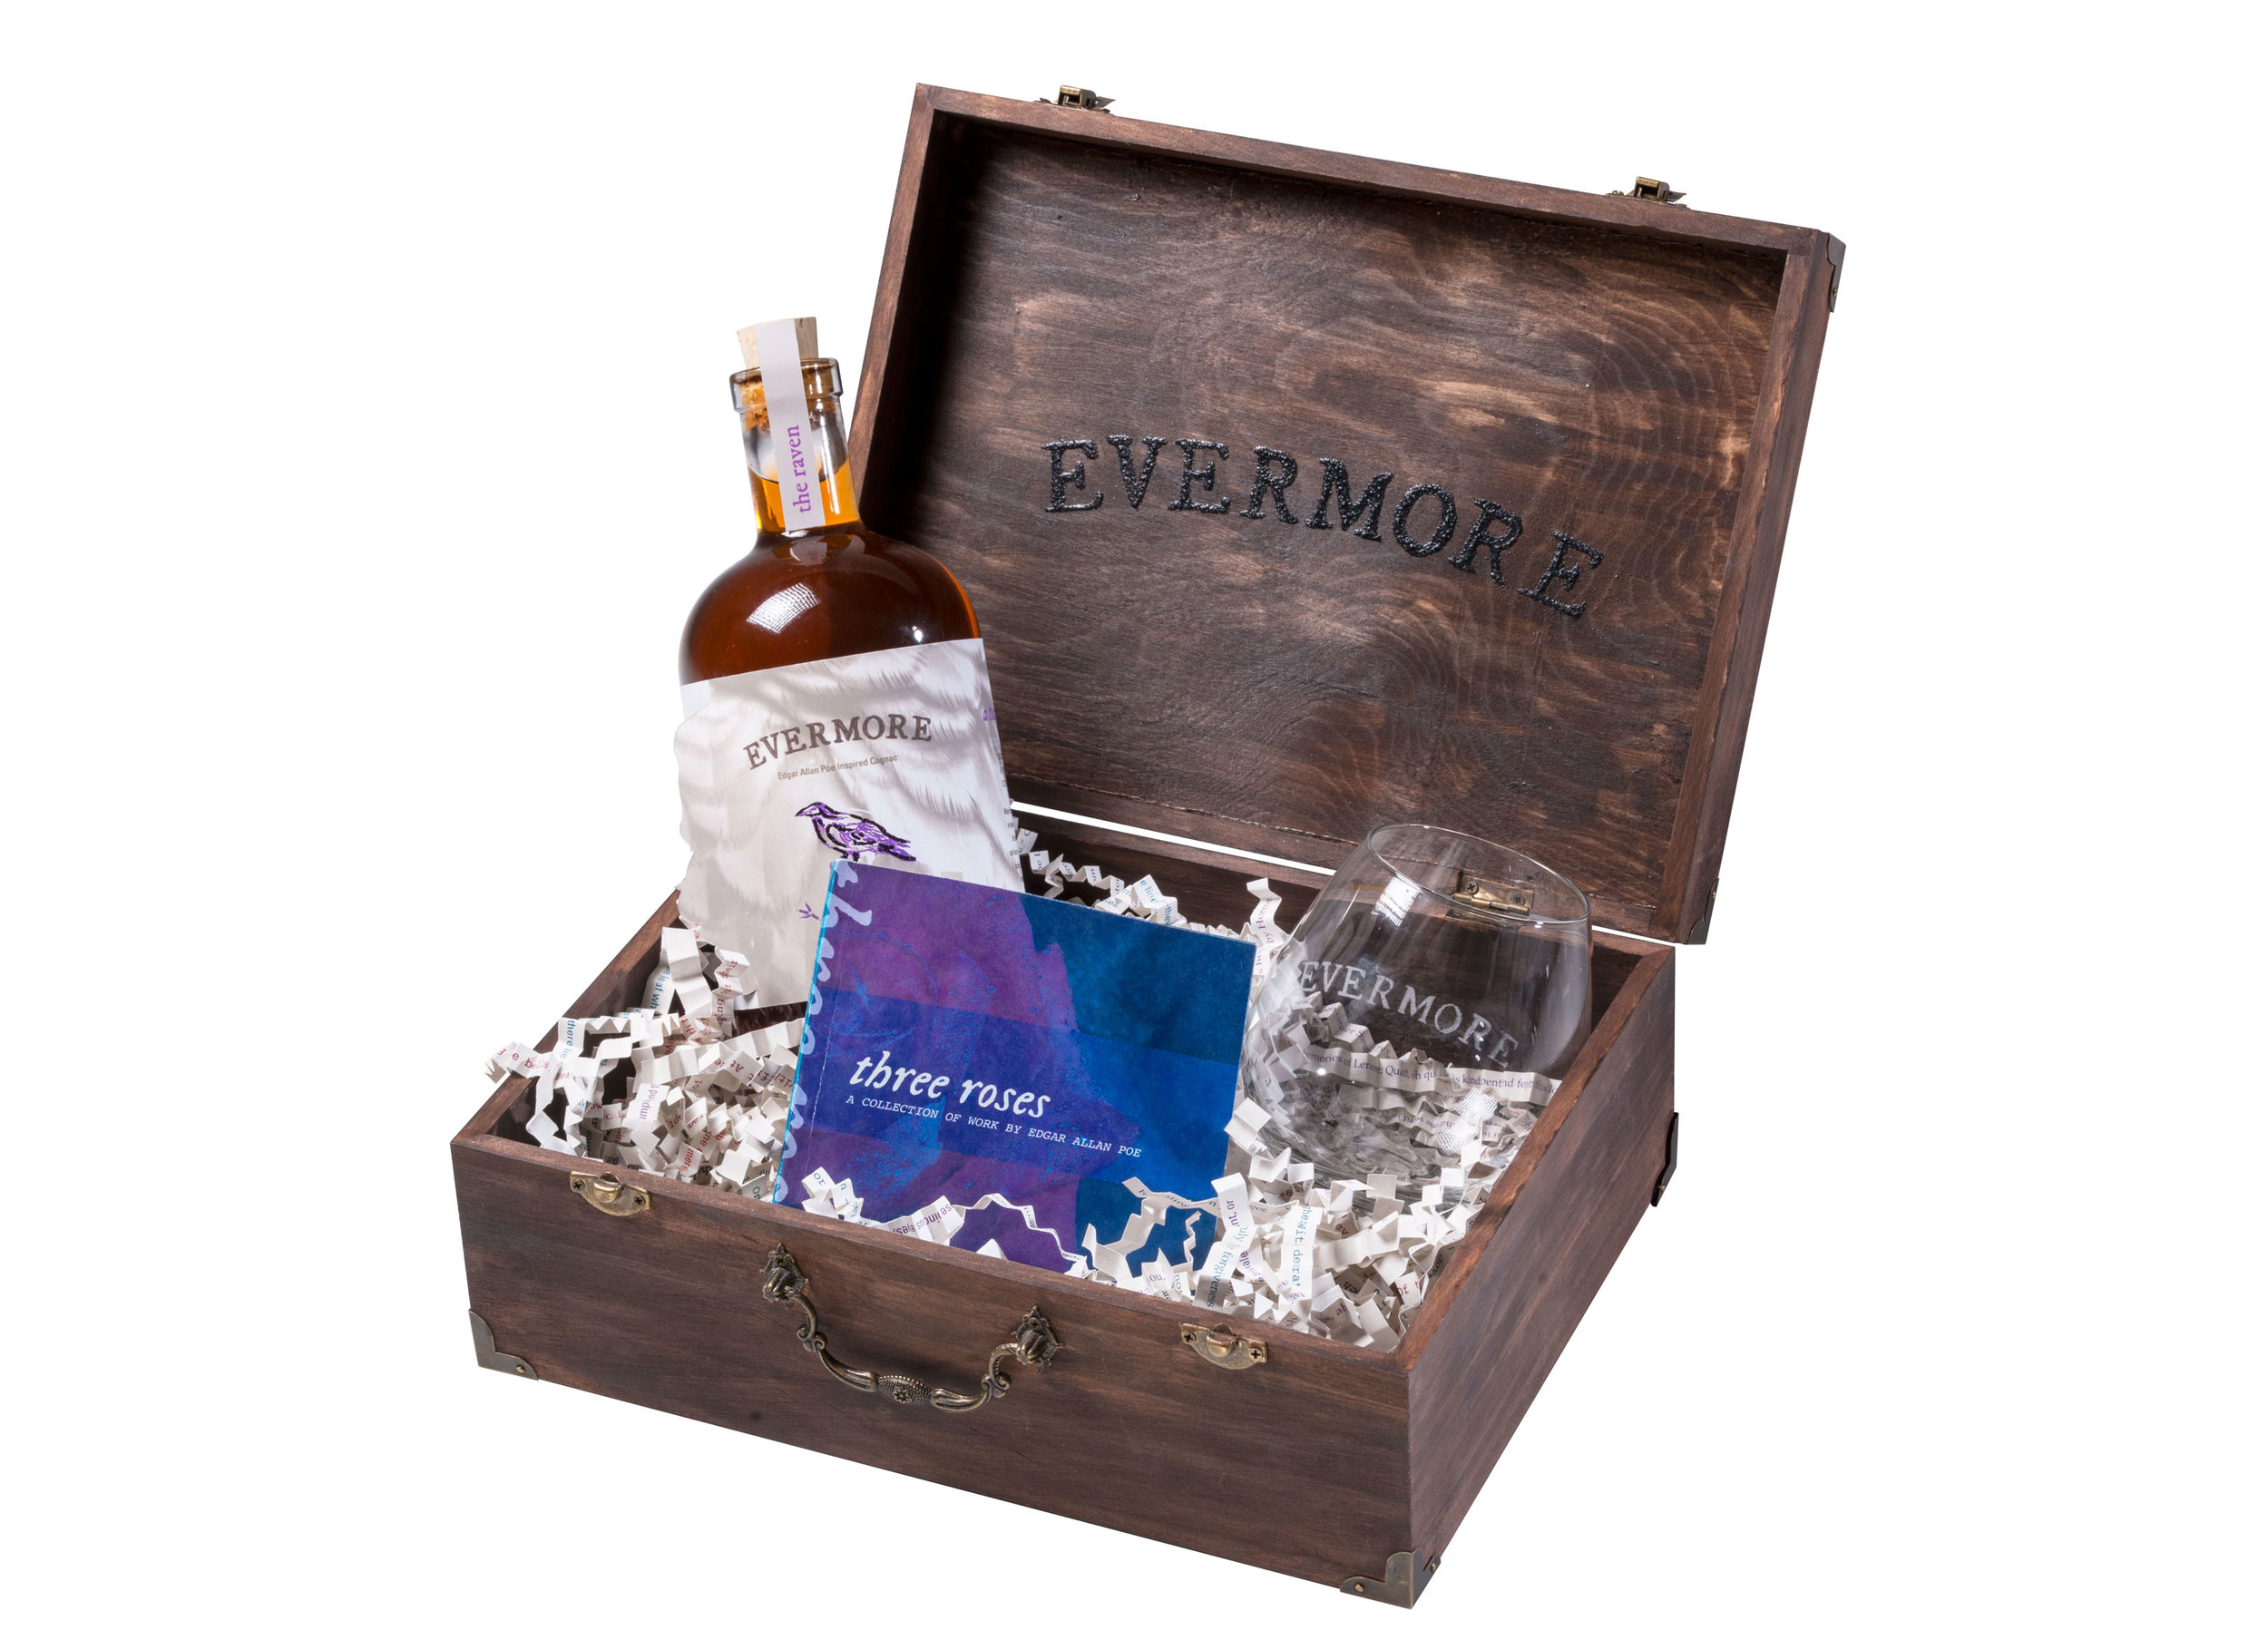 Evermore_Box2.jpg